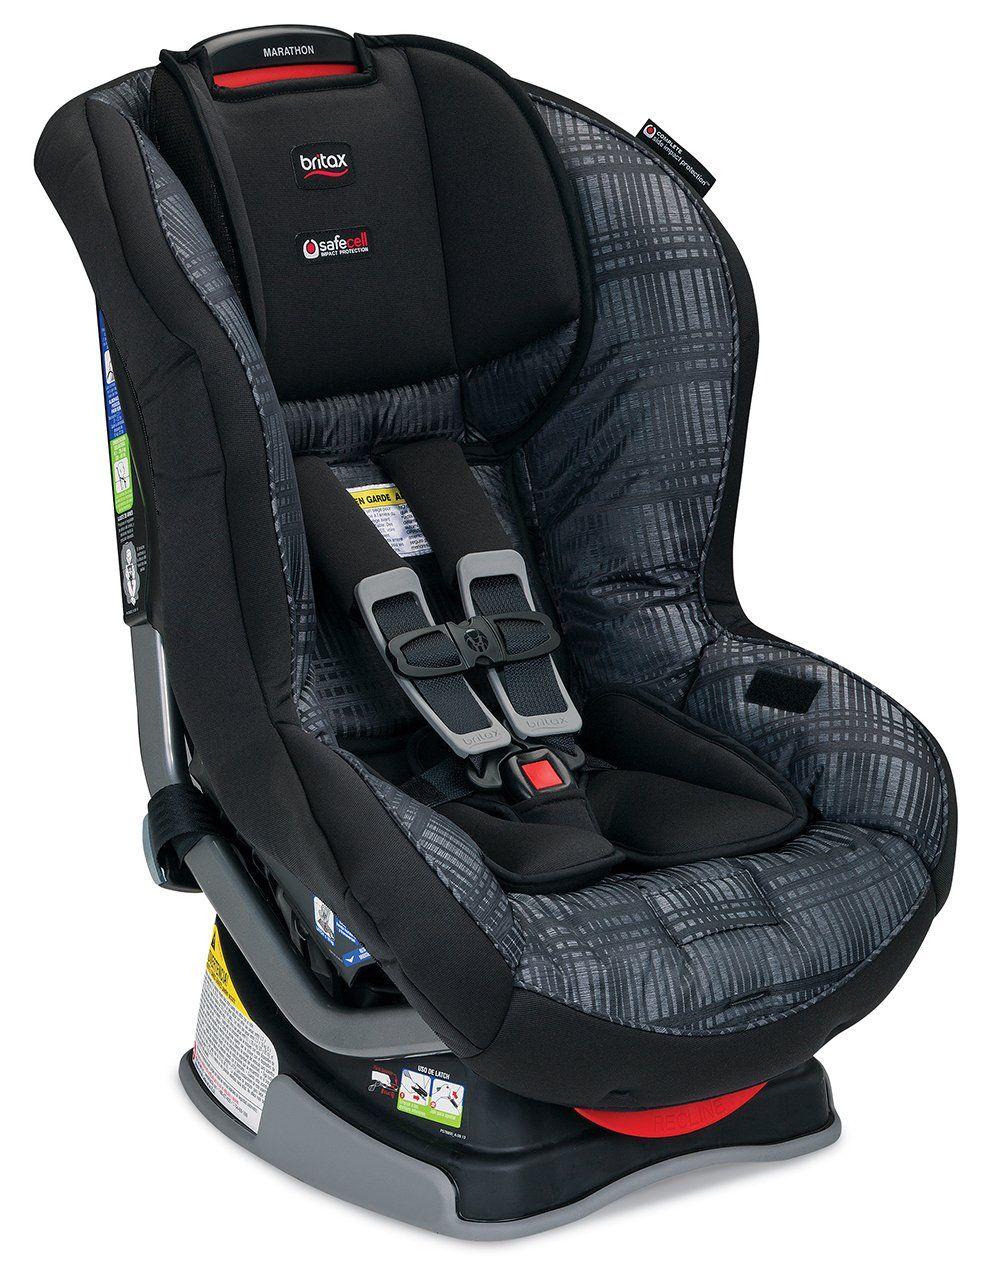 Robot Check Car Seats Convertible Car Seat Baby Car Seats